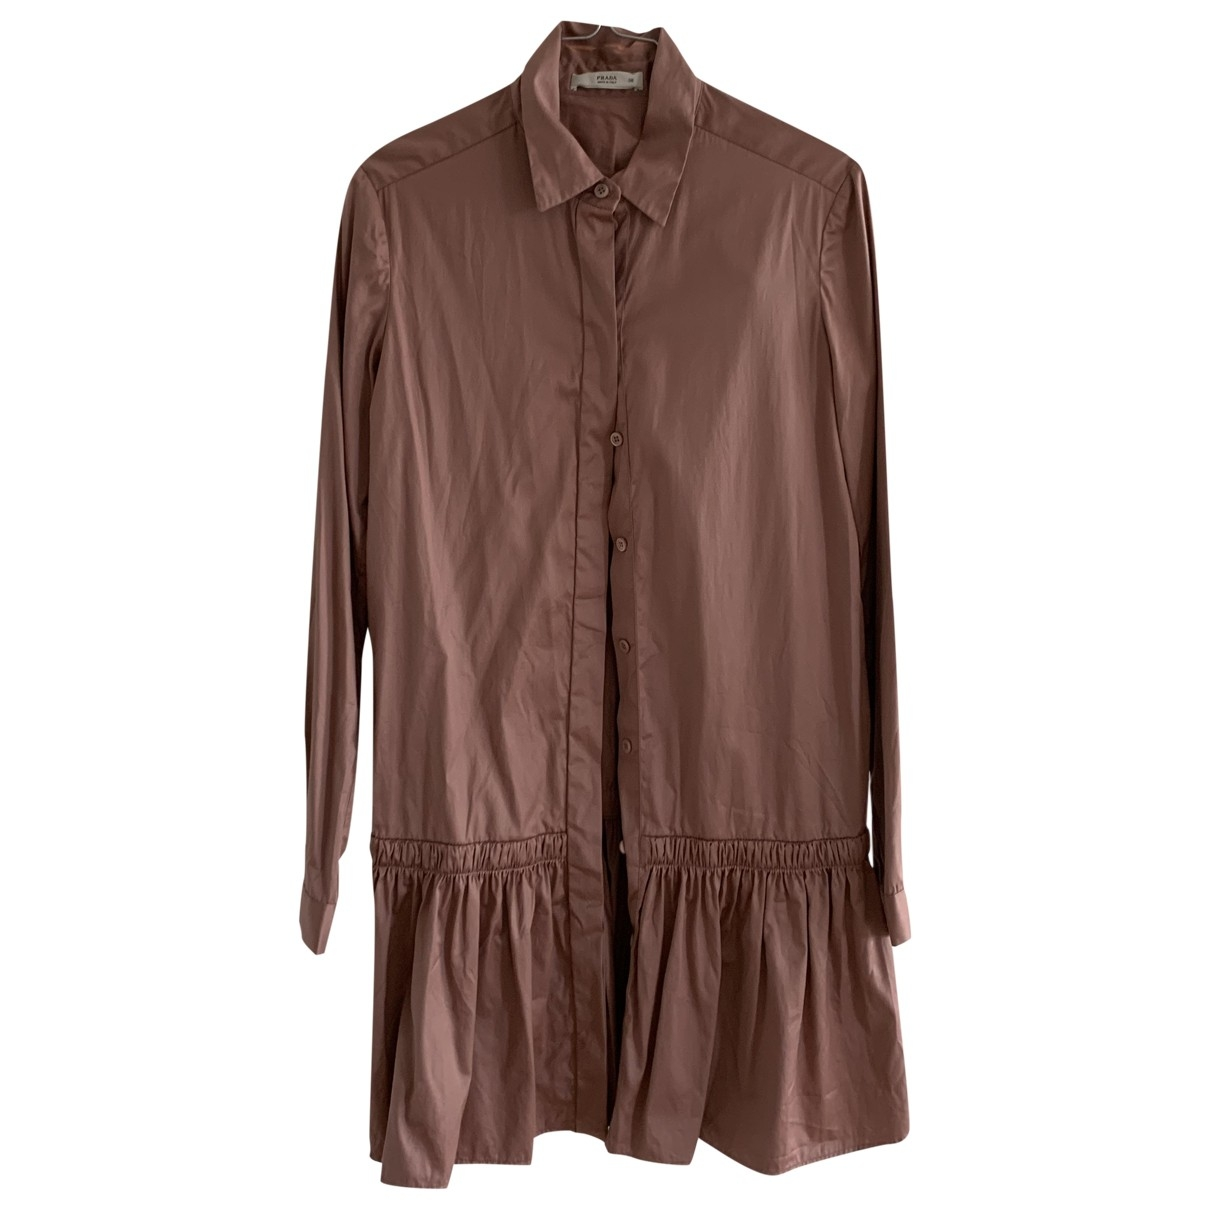 Prada \N Pink Cotton dress for Women 38 IT